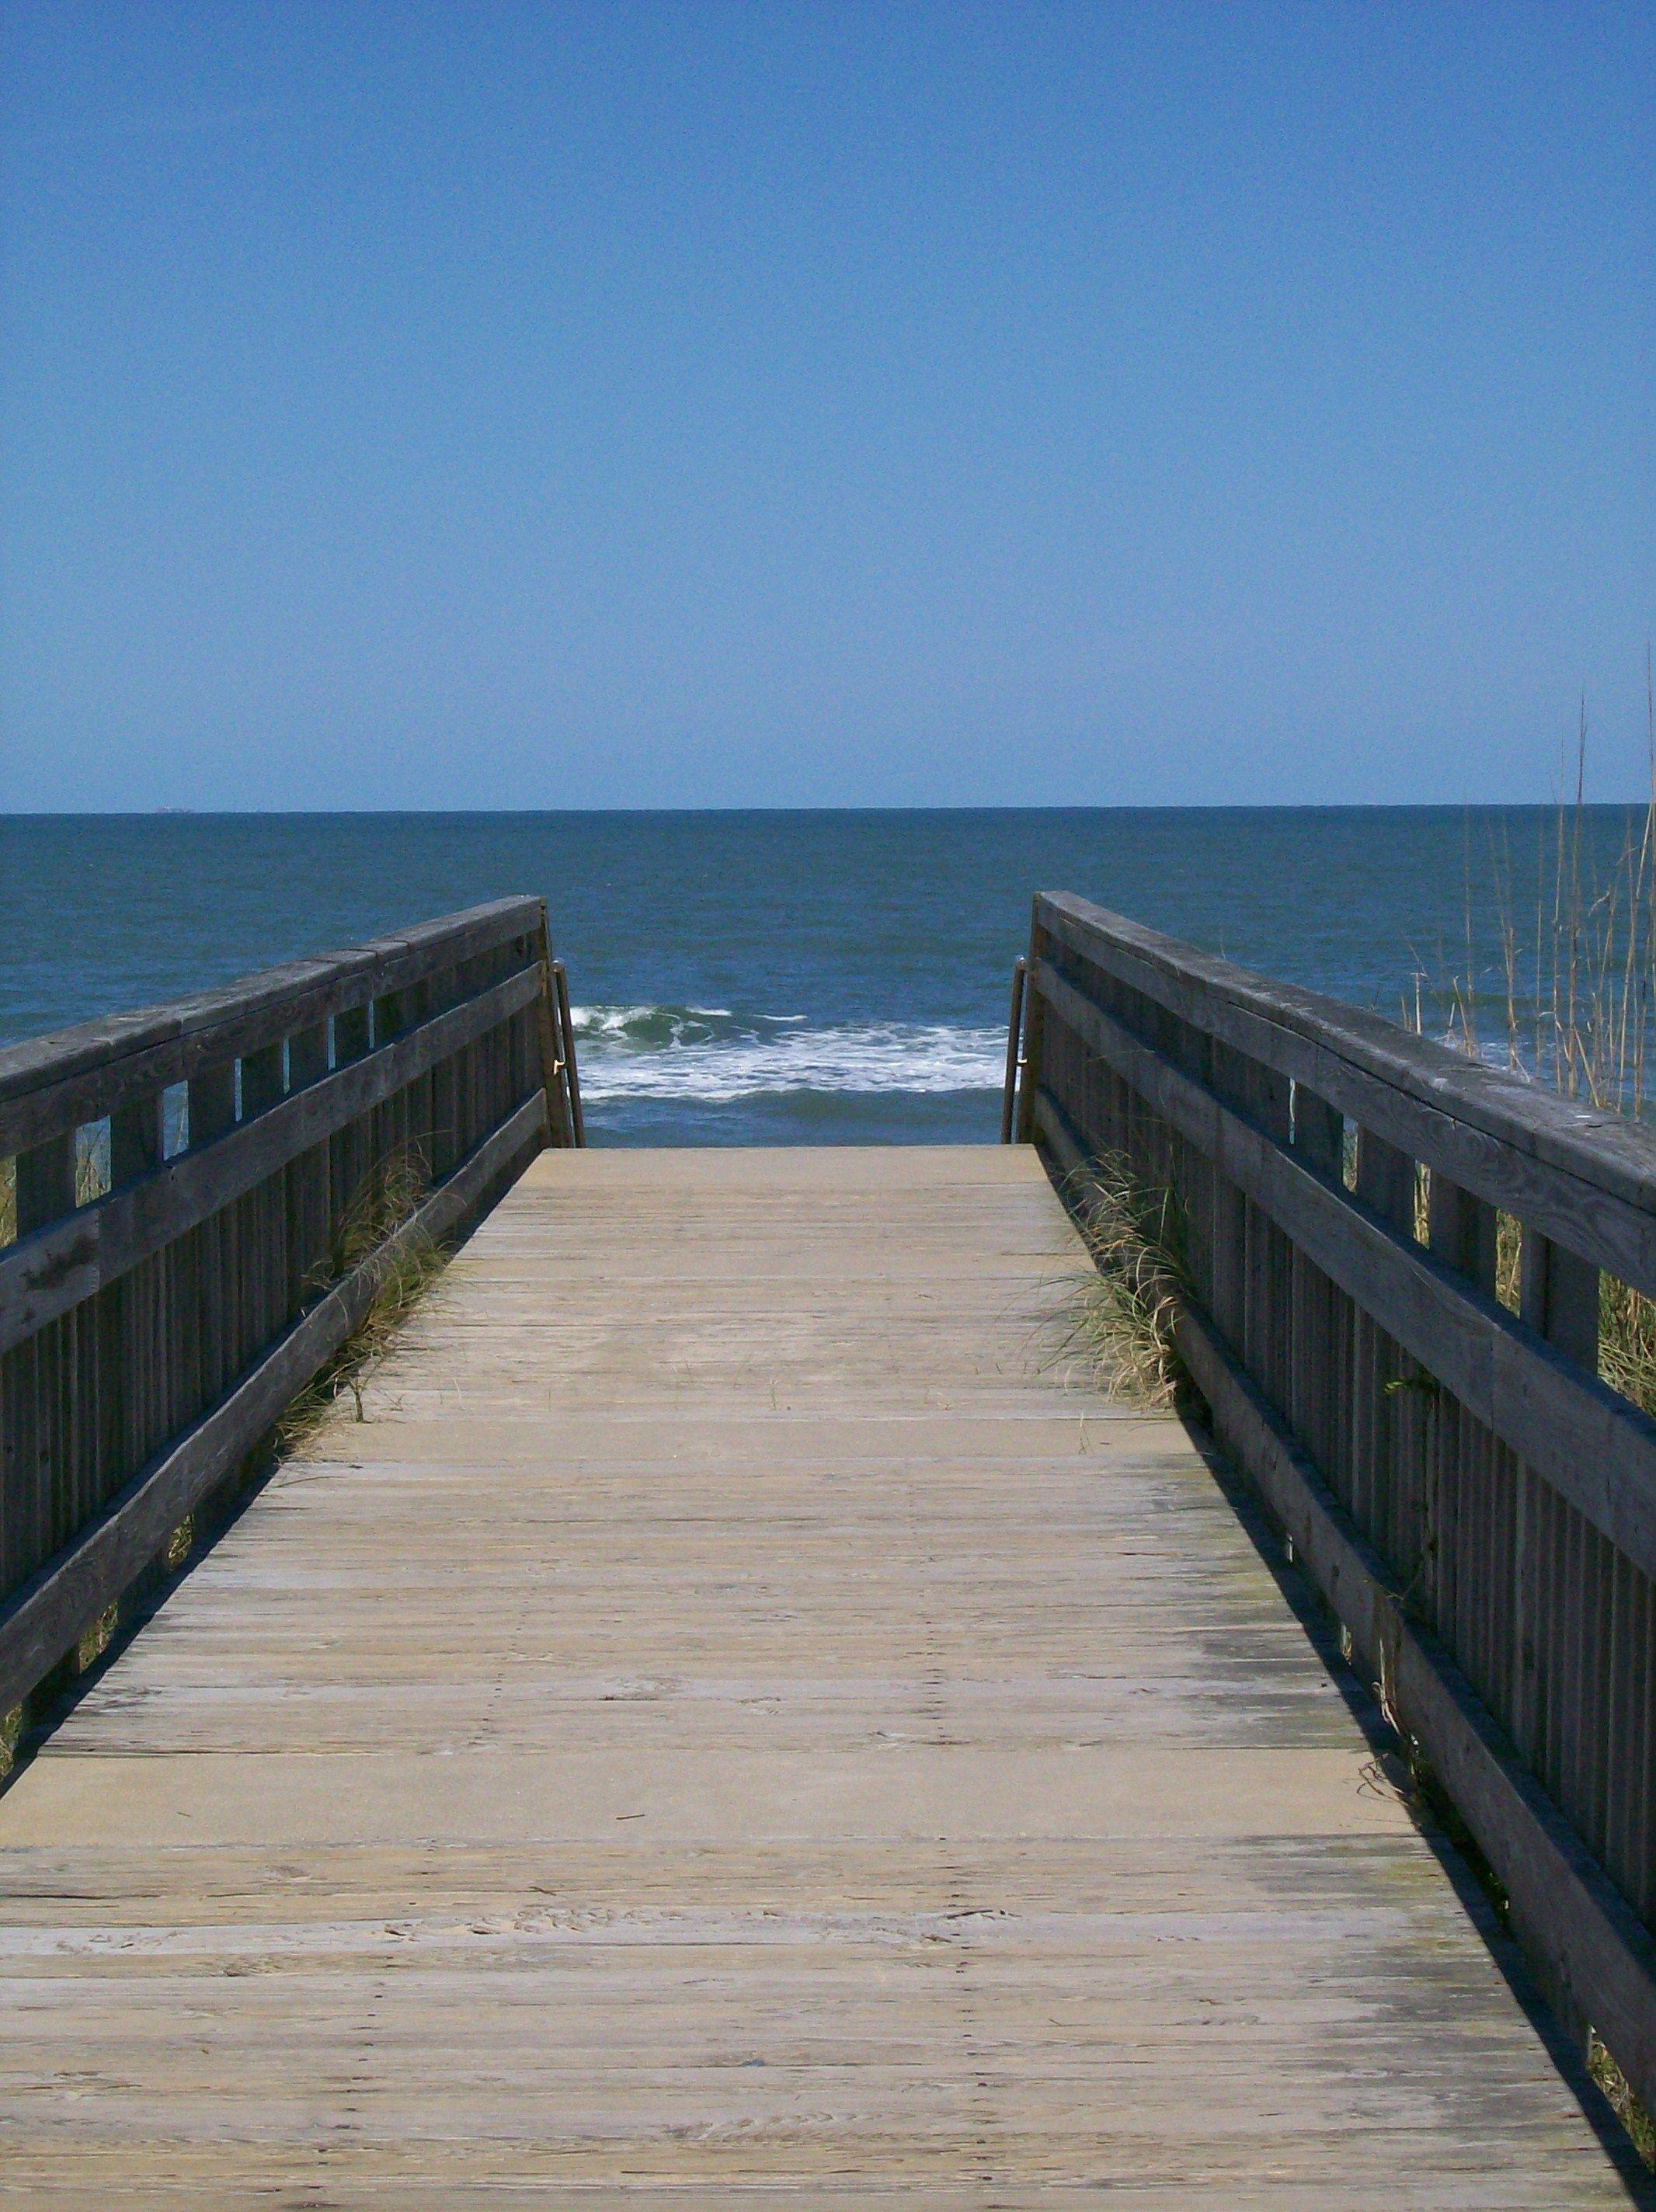 Dam neck beach dam neck naval base va beach virginia for Fishing spots in virginia beach